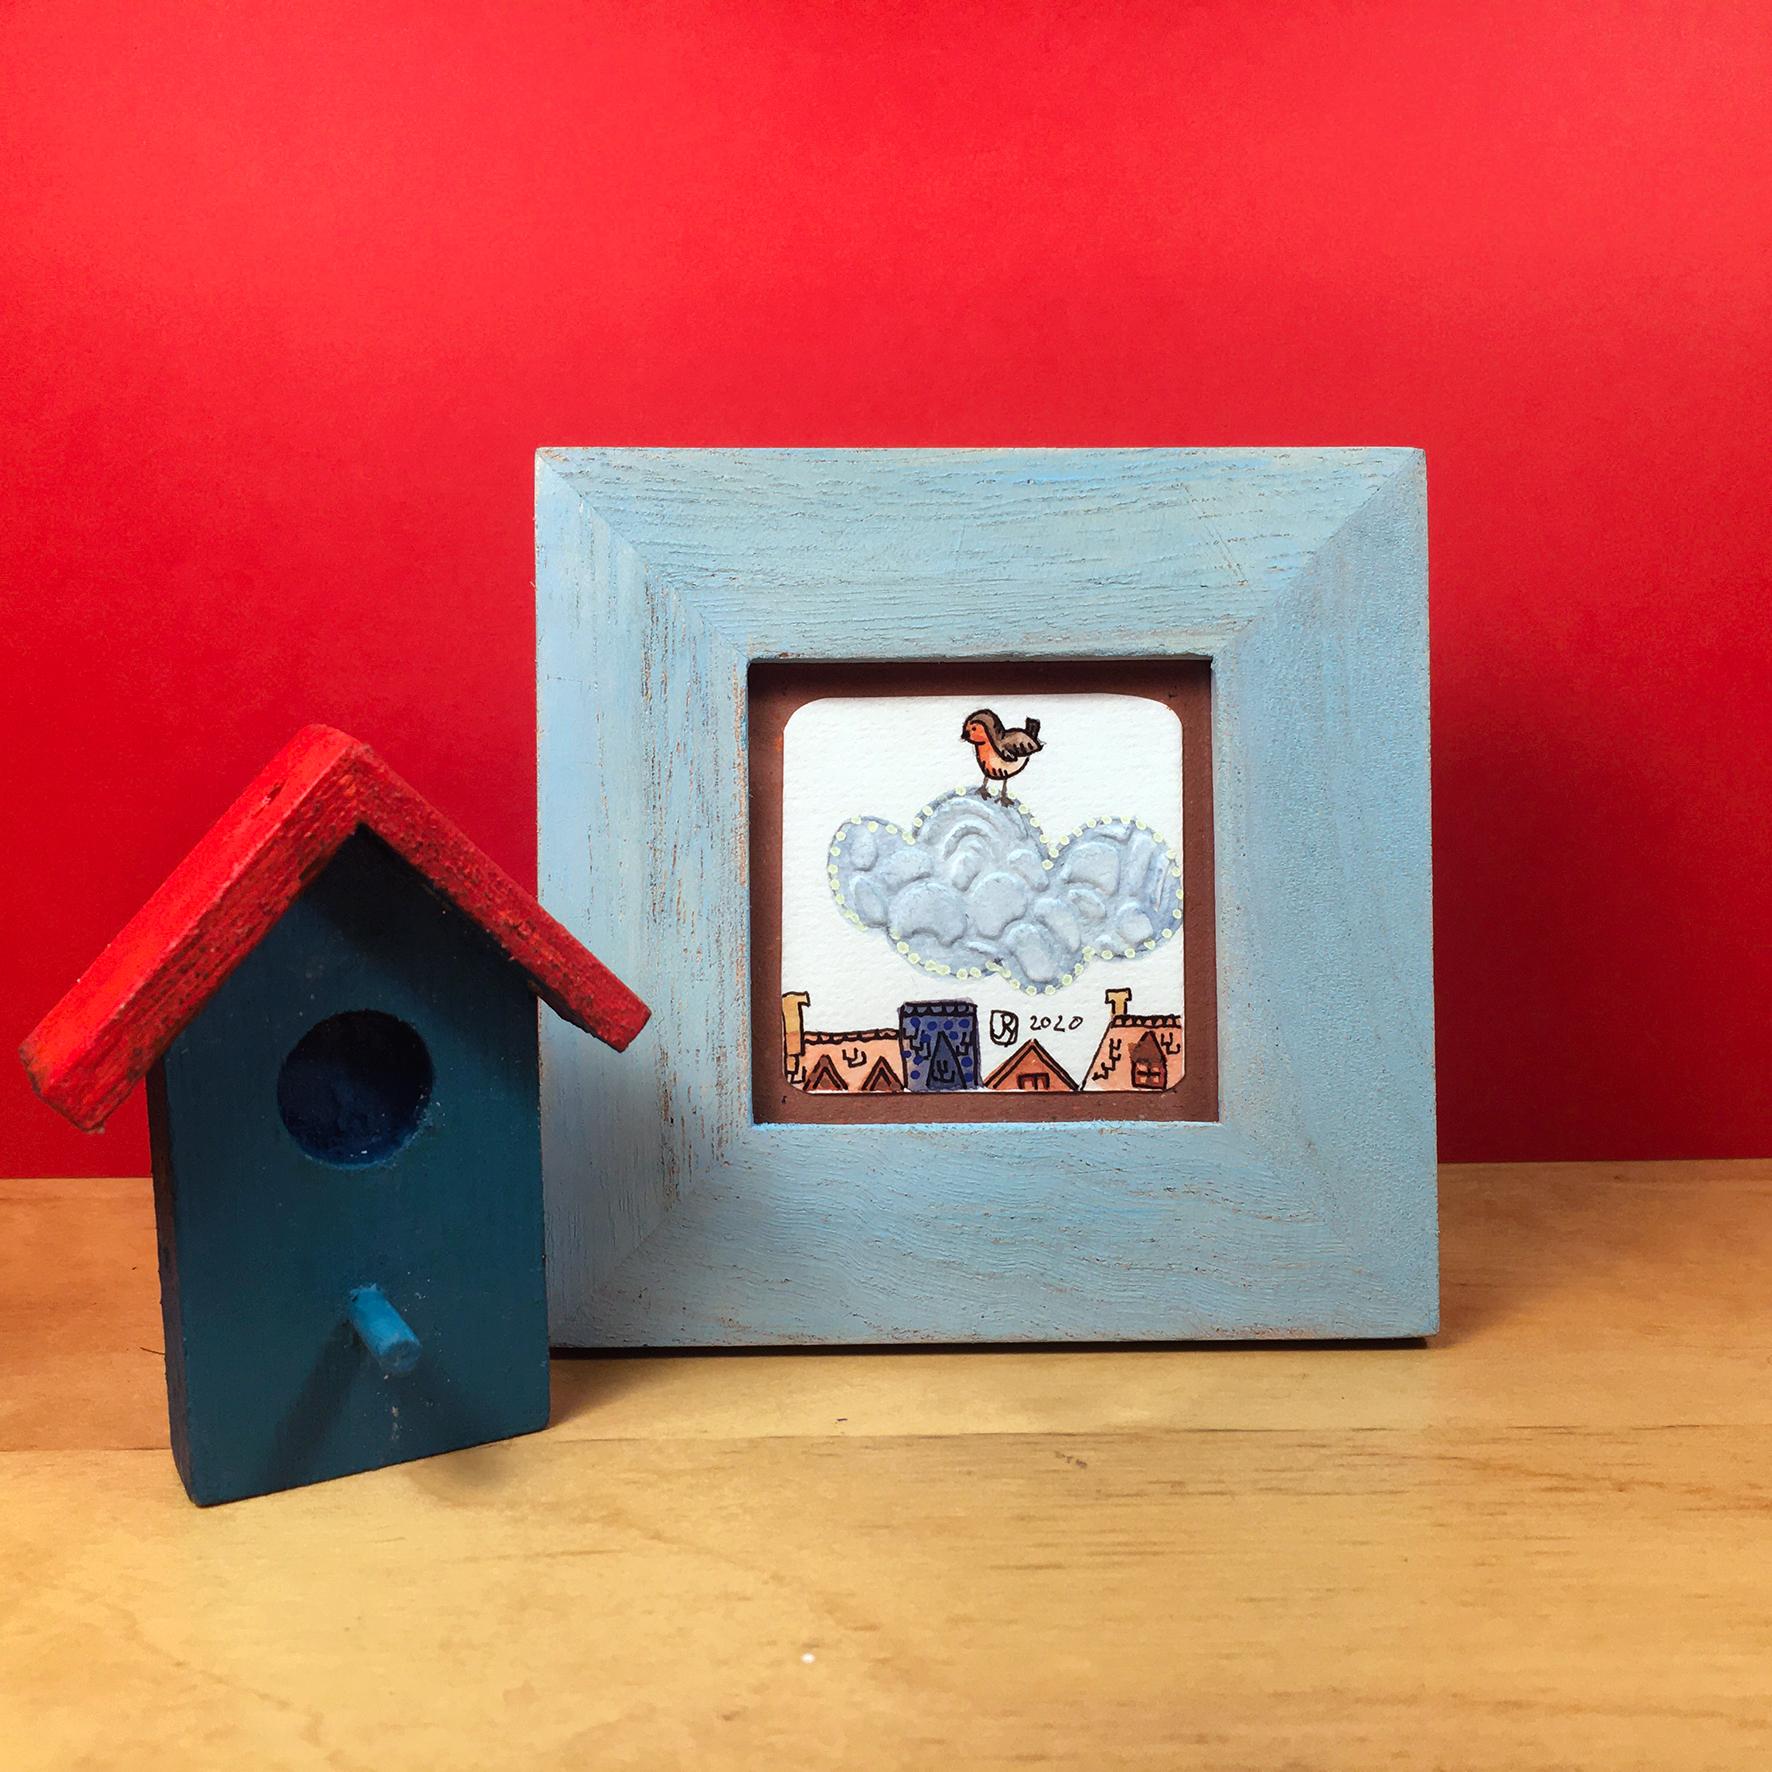 """Par dessus les toits 1"" ©Julia Ratsimandresy / Mini-aquarelle encadrée / Cadre bois bleu+verre 10x10 cm / 15€ hors fdp /Exemplaire unique!"